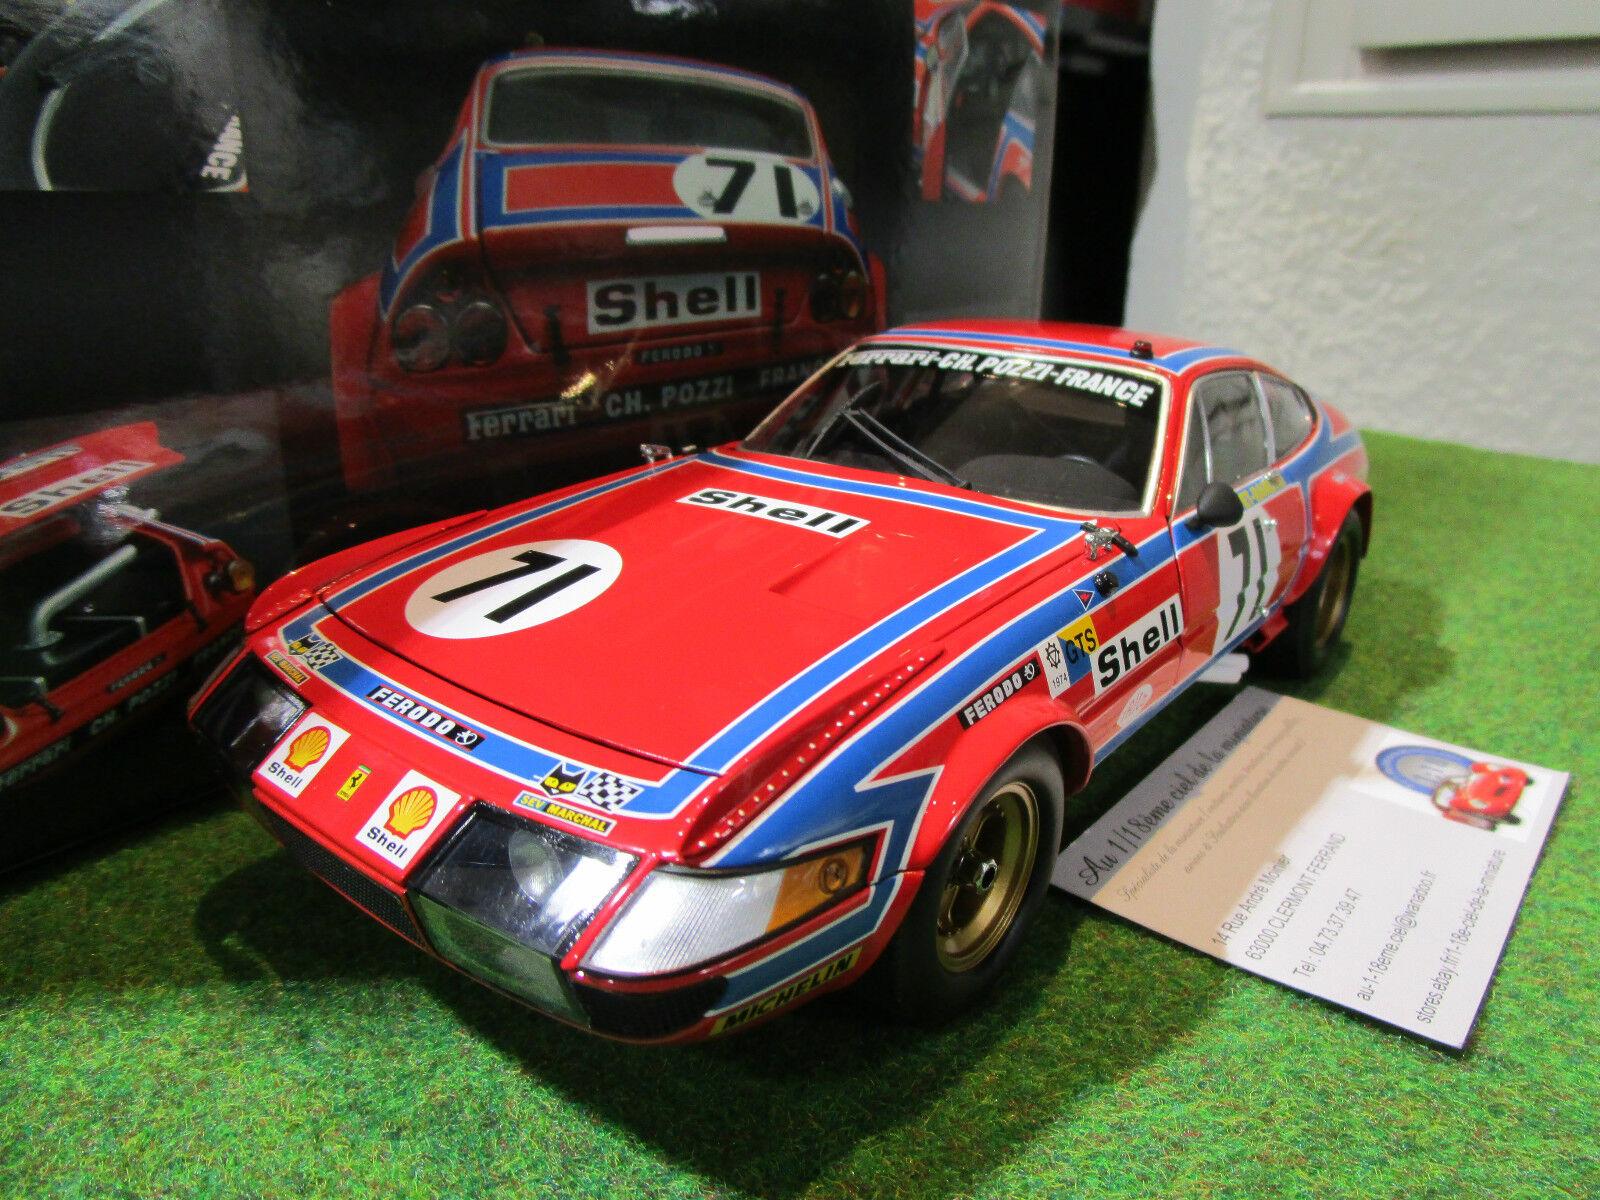 FERRARI 365 GTB4 DAYTONA  71 LE MANS 1974 a 1 18 KYOSHO 08164A voiture miniature